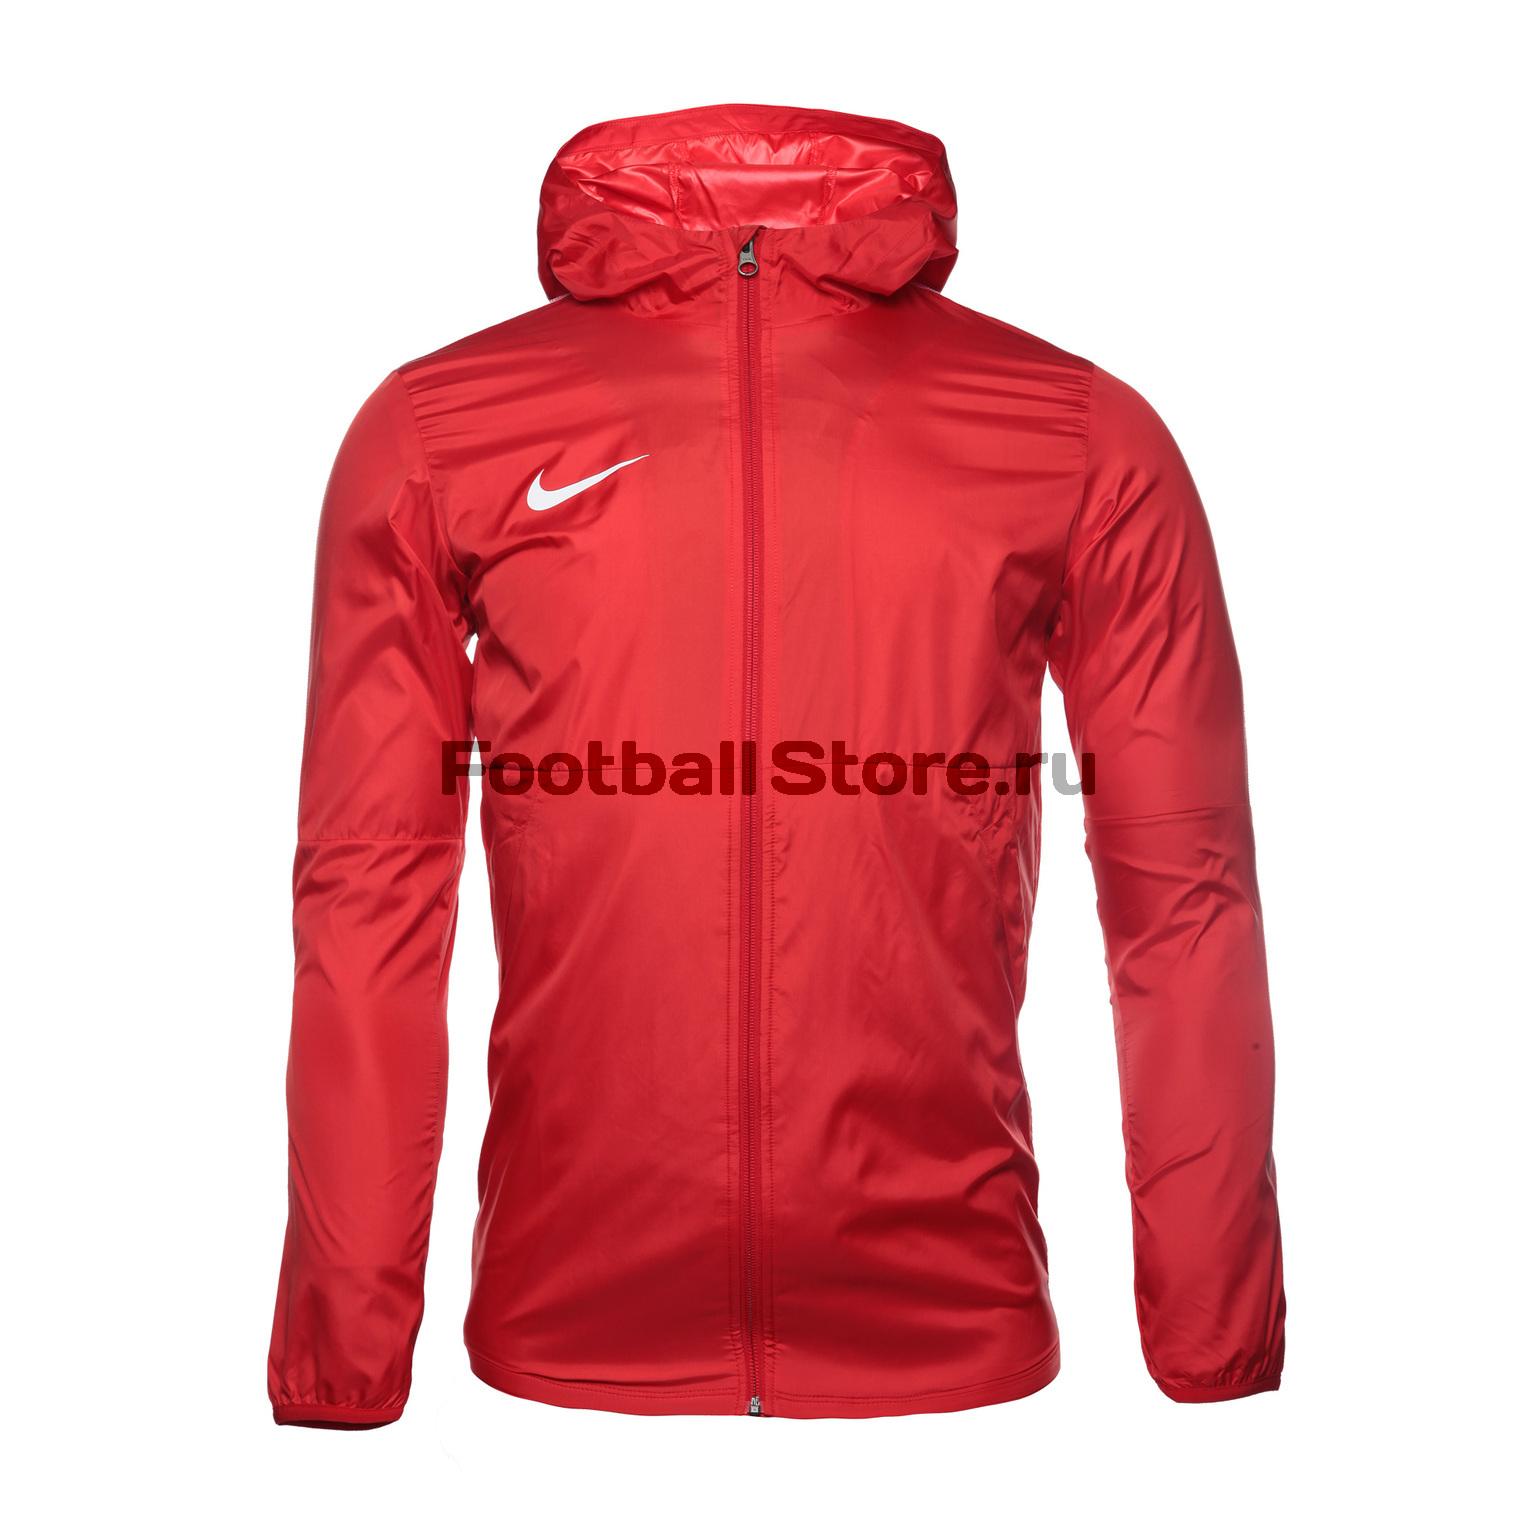 fdd869b9 Ветровка Nike Dry Park18 Rain AA2090-657 – купить в интернет магазине  footballstore, цена, фото